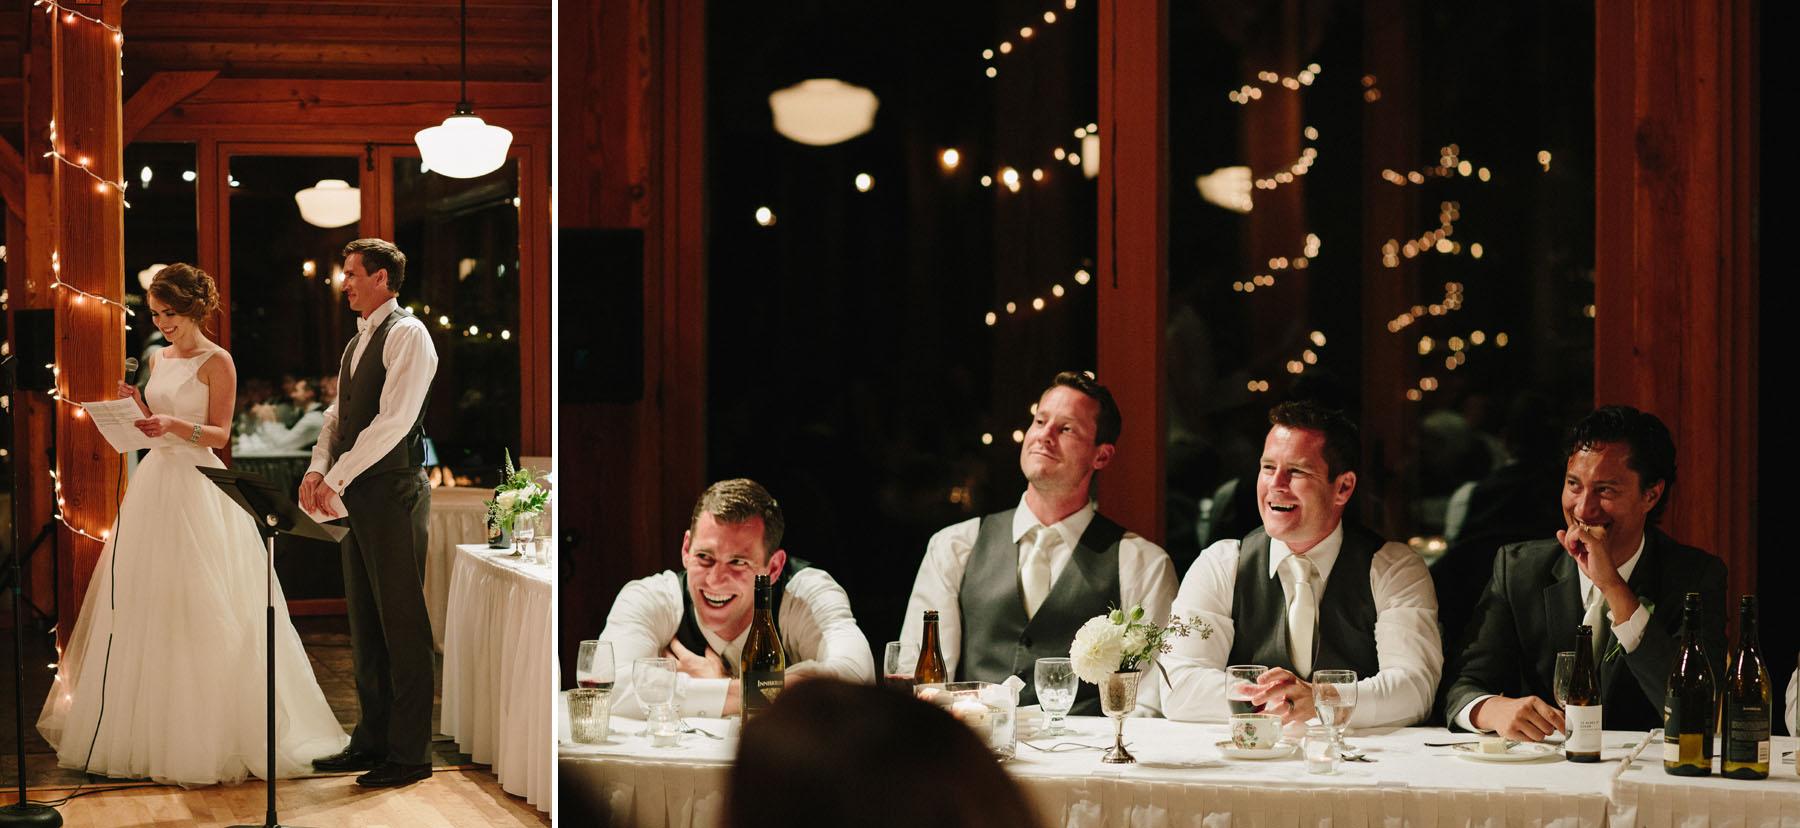 thetis-island-wedding-photographer-rp-rn-190.jpg